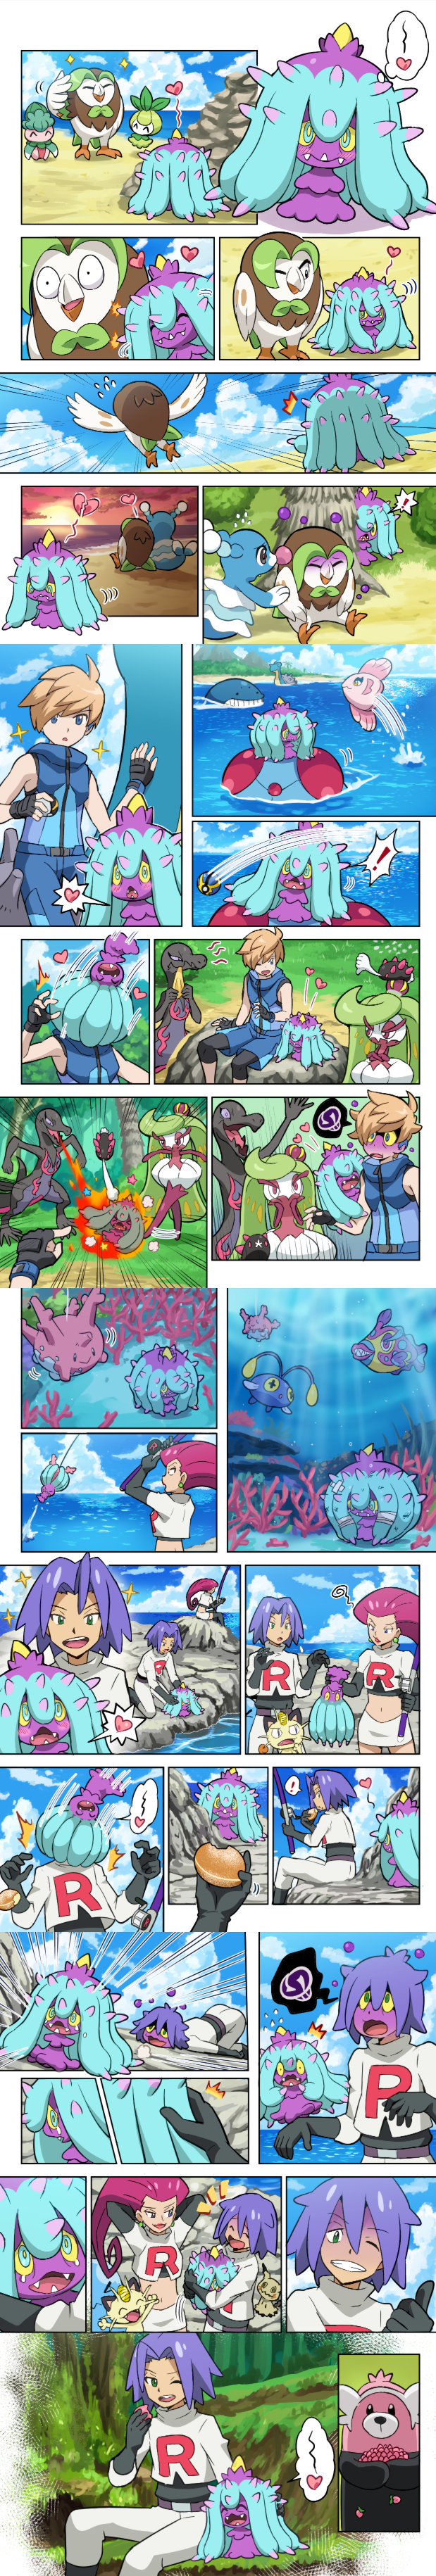 how to catch mareanie pokemon moon